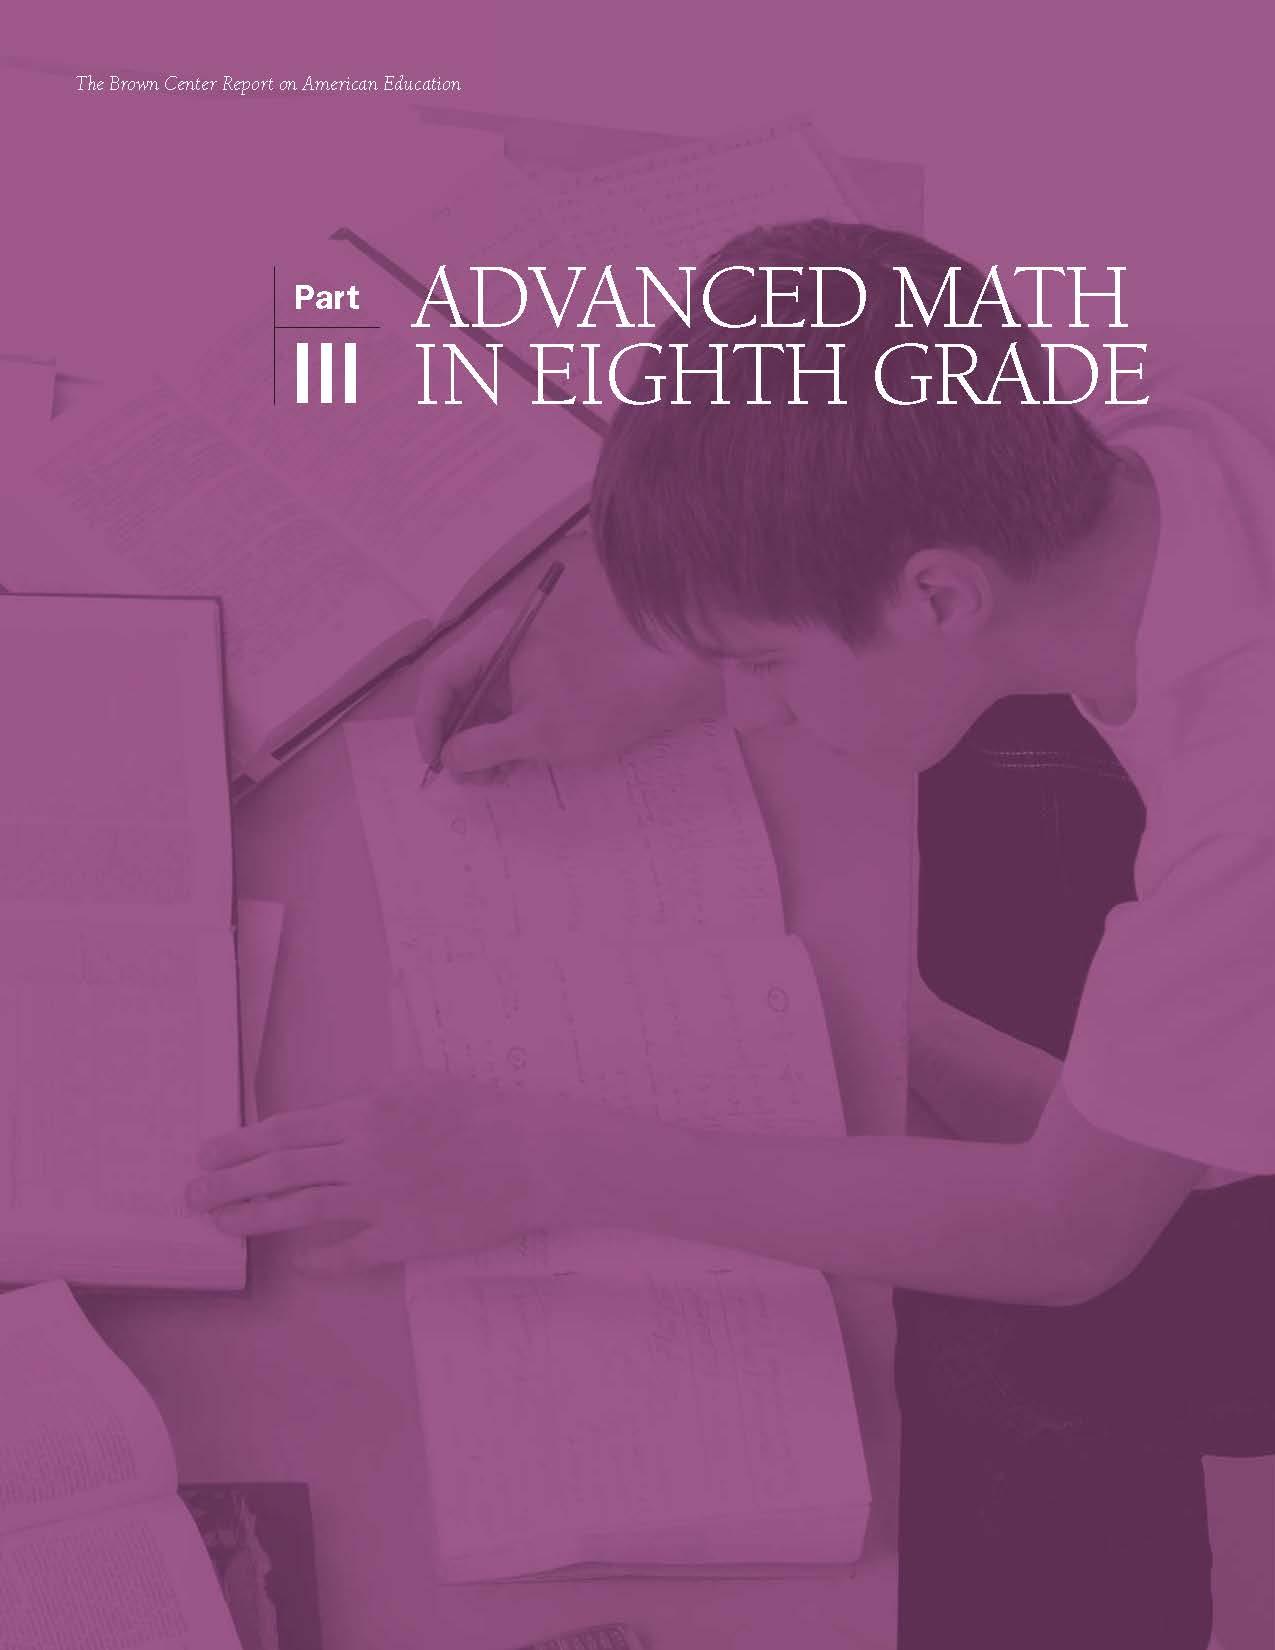 Advanced Math in Eighth Grade